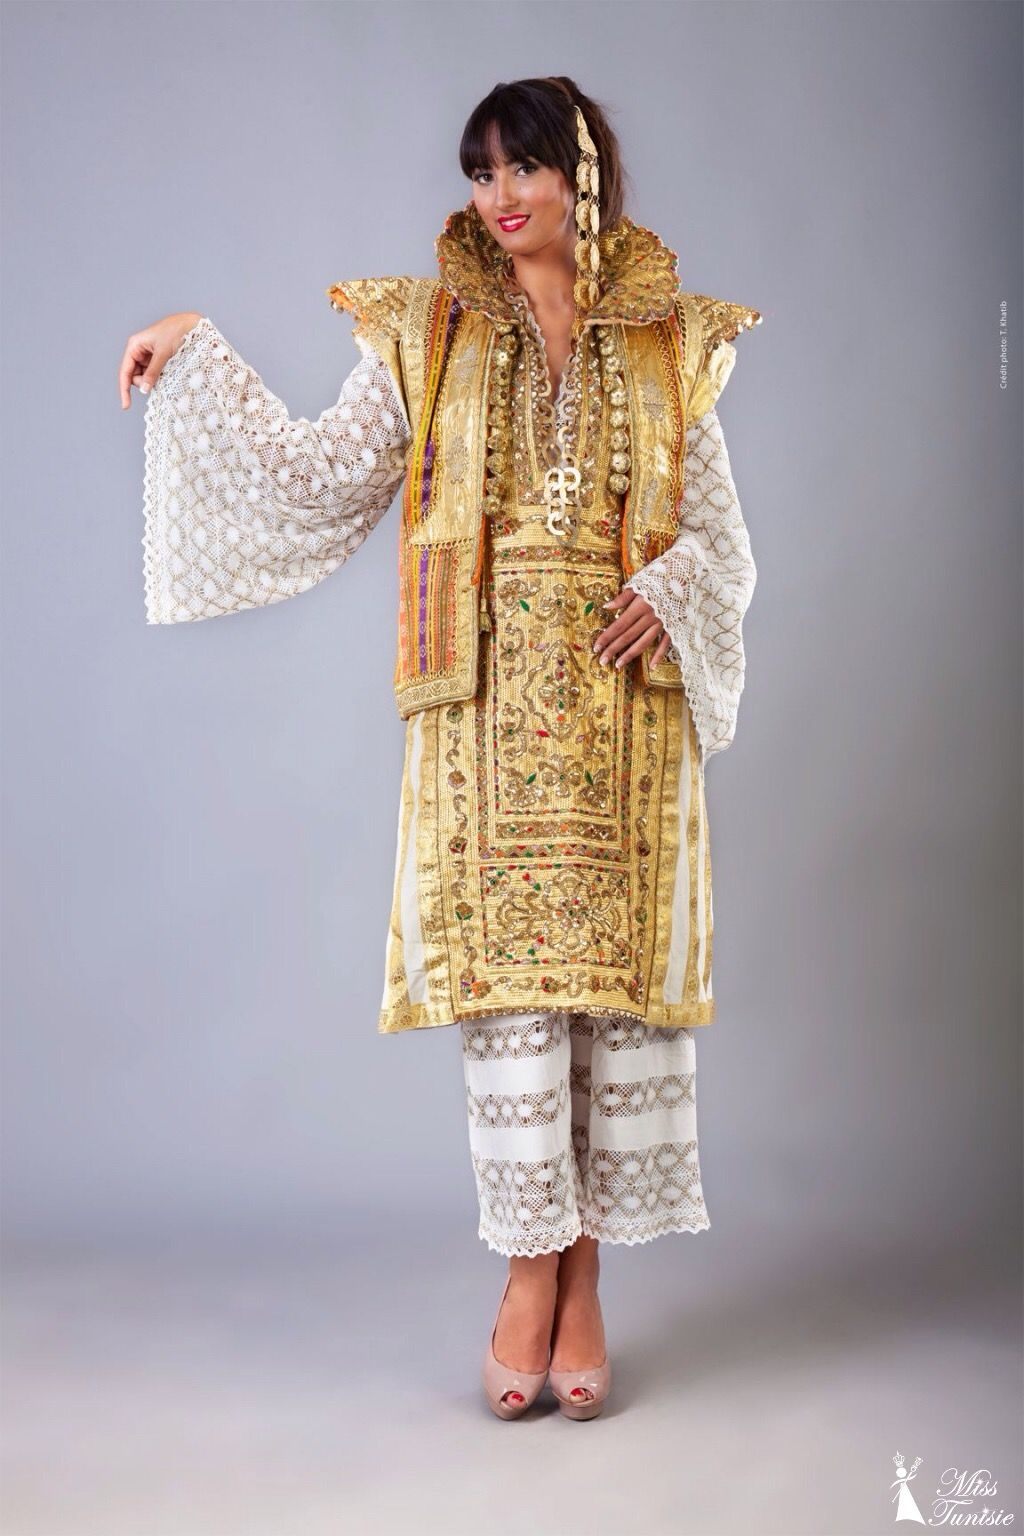 Habit Traditionnel De Tunisie Habit Traditionnel Tunisien Robe